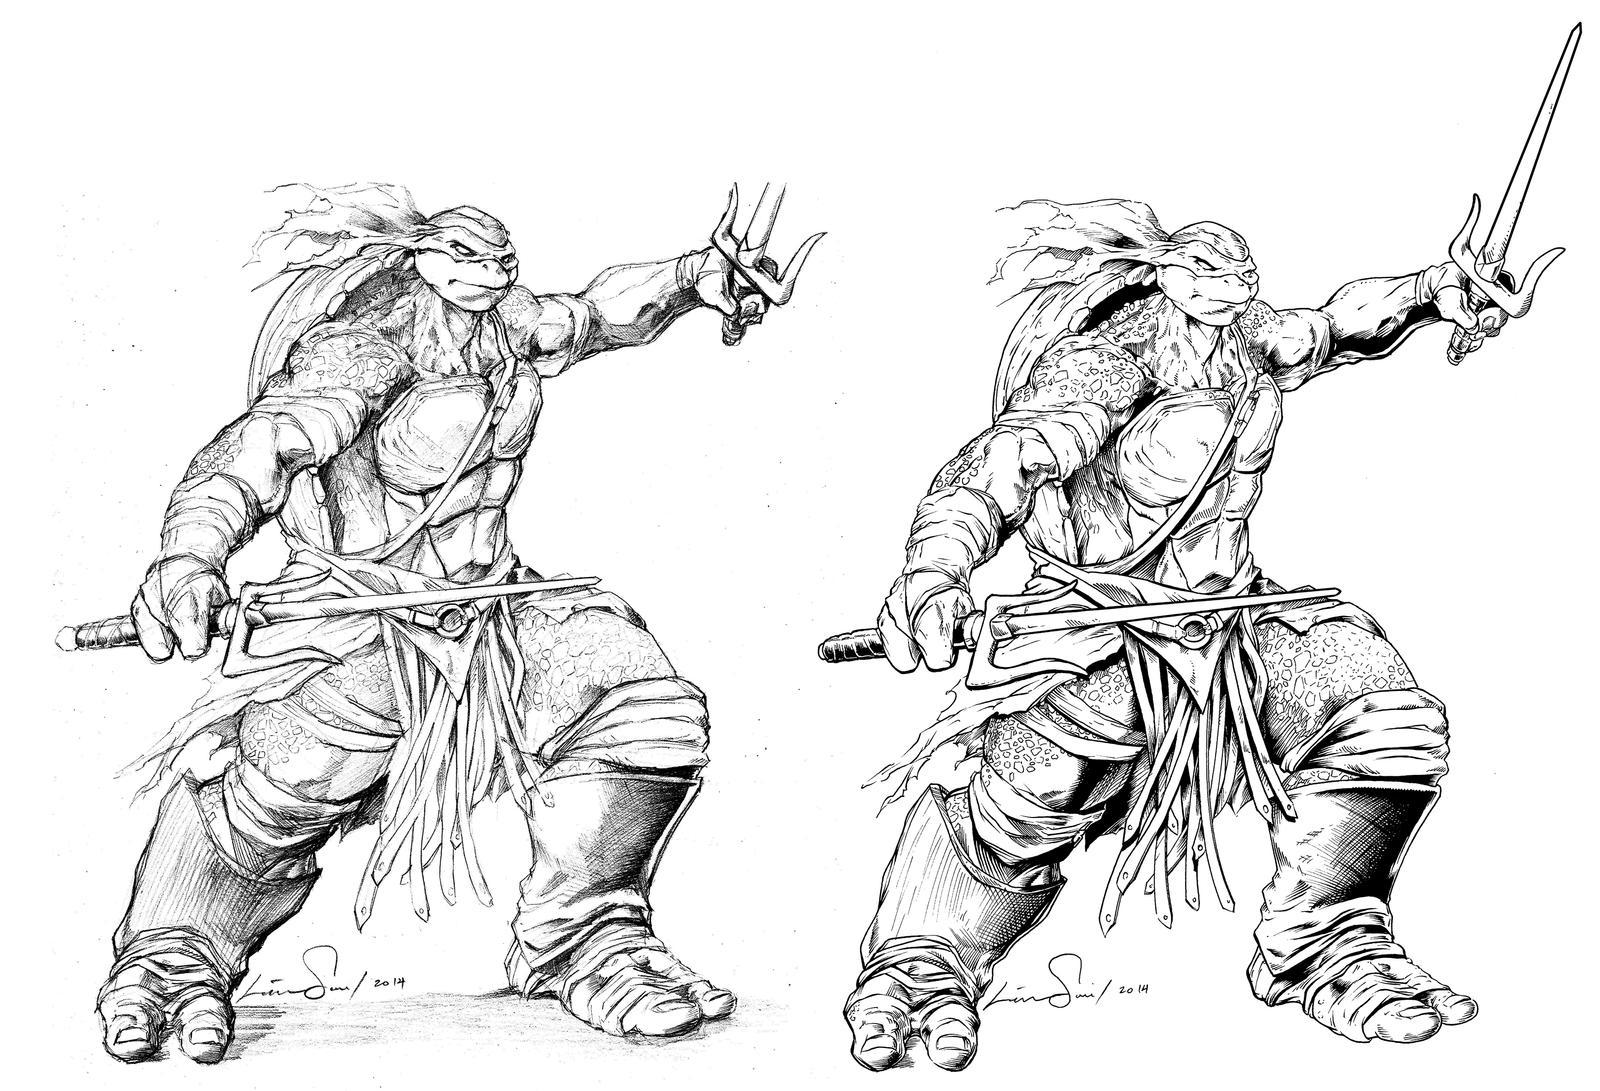 Raphael of the teenage mutant ninja turtles by cadre on for Raphael ninja turtle coloring pages